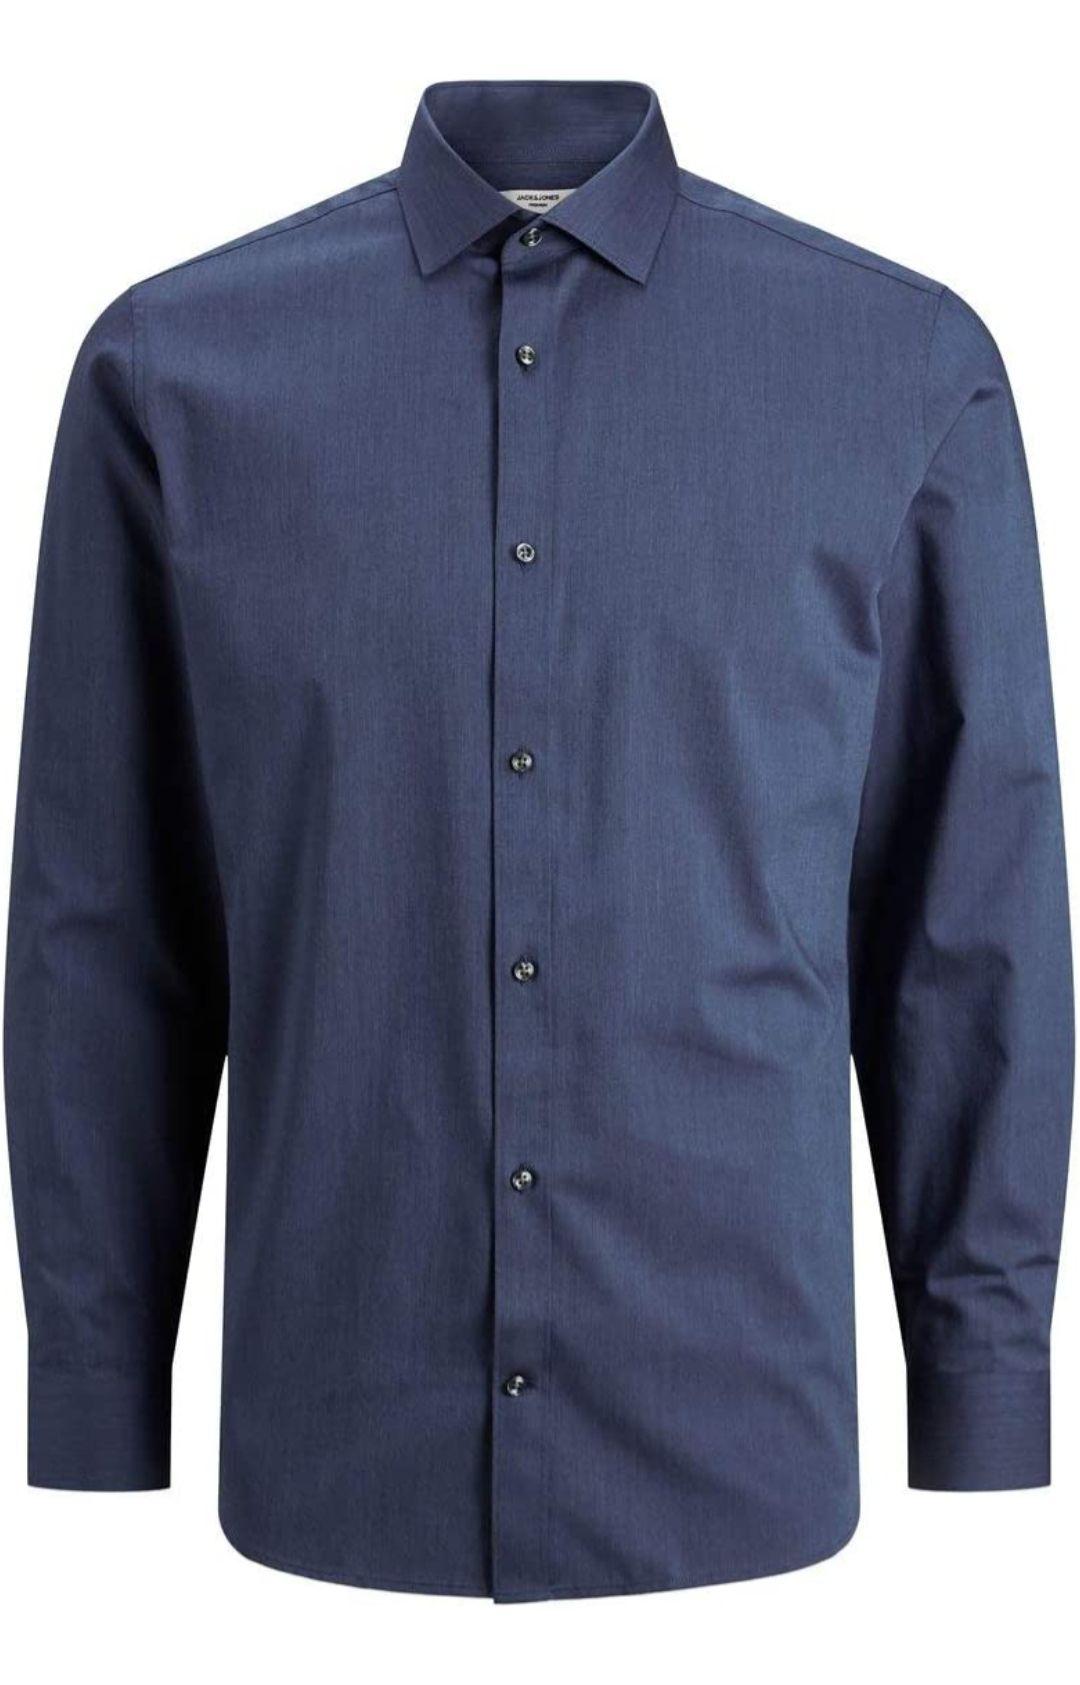 JACK & JONES JPRBLAROYAL SHIRT L/S NOOS heren hemd